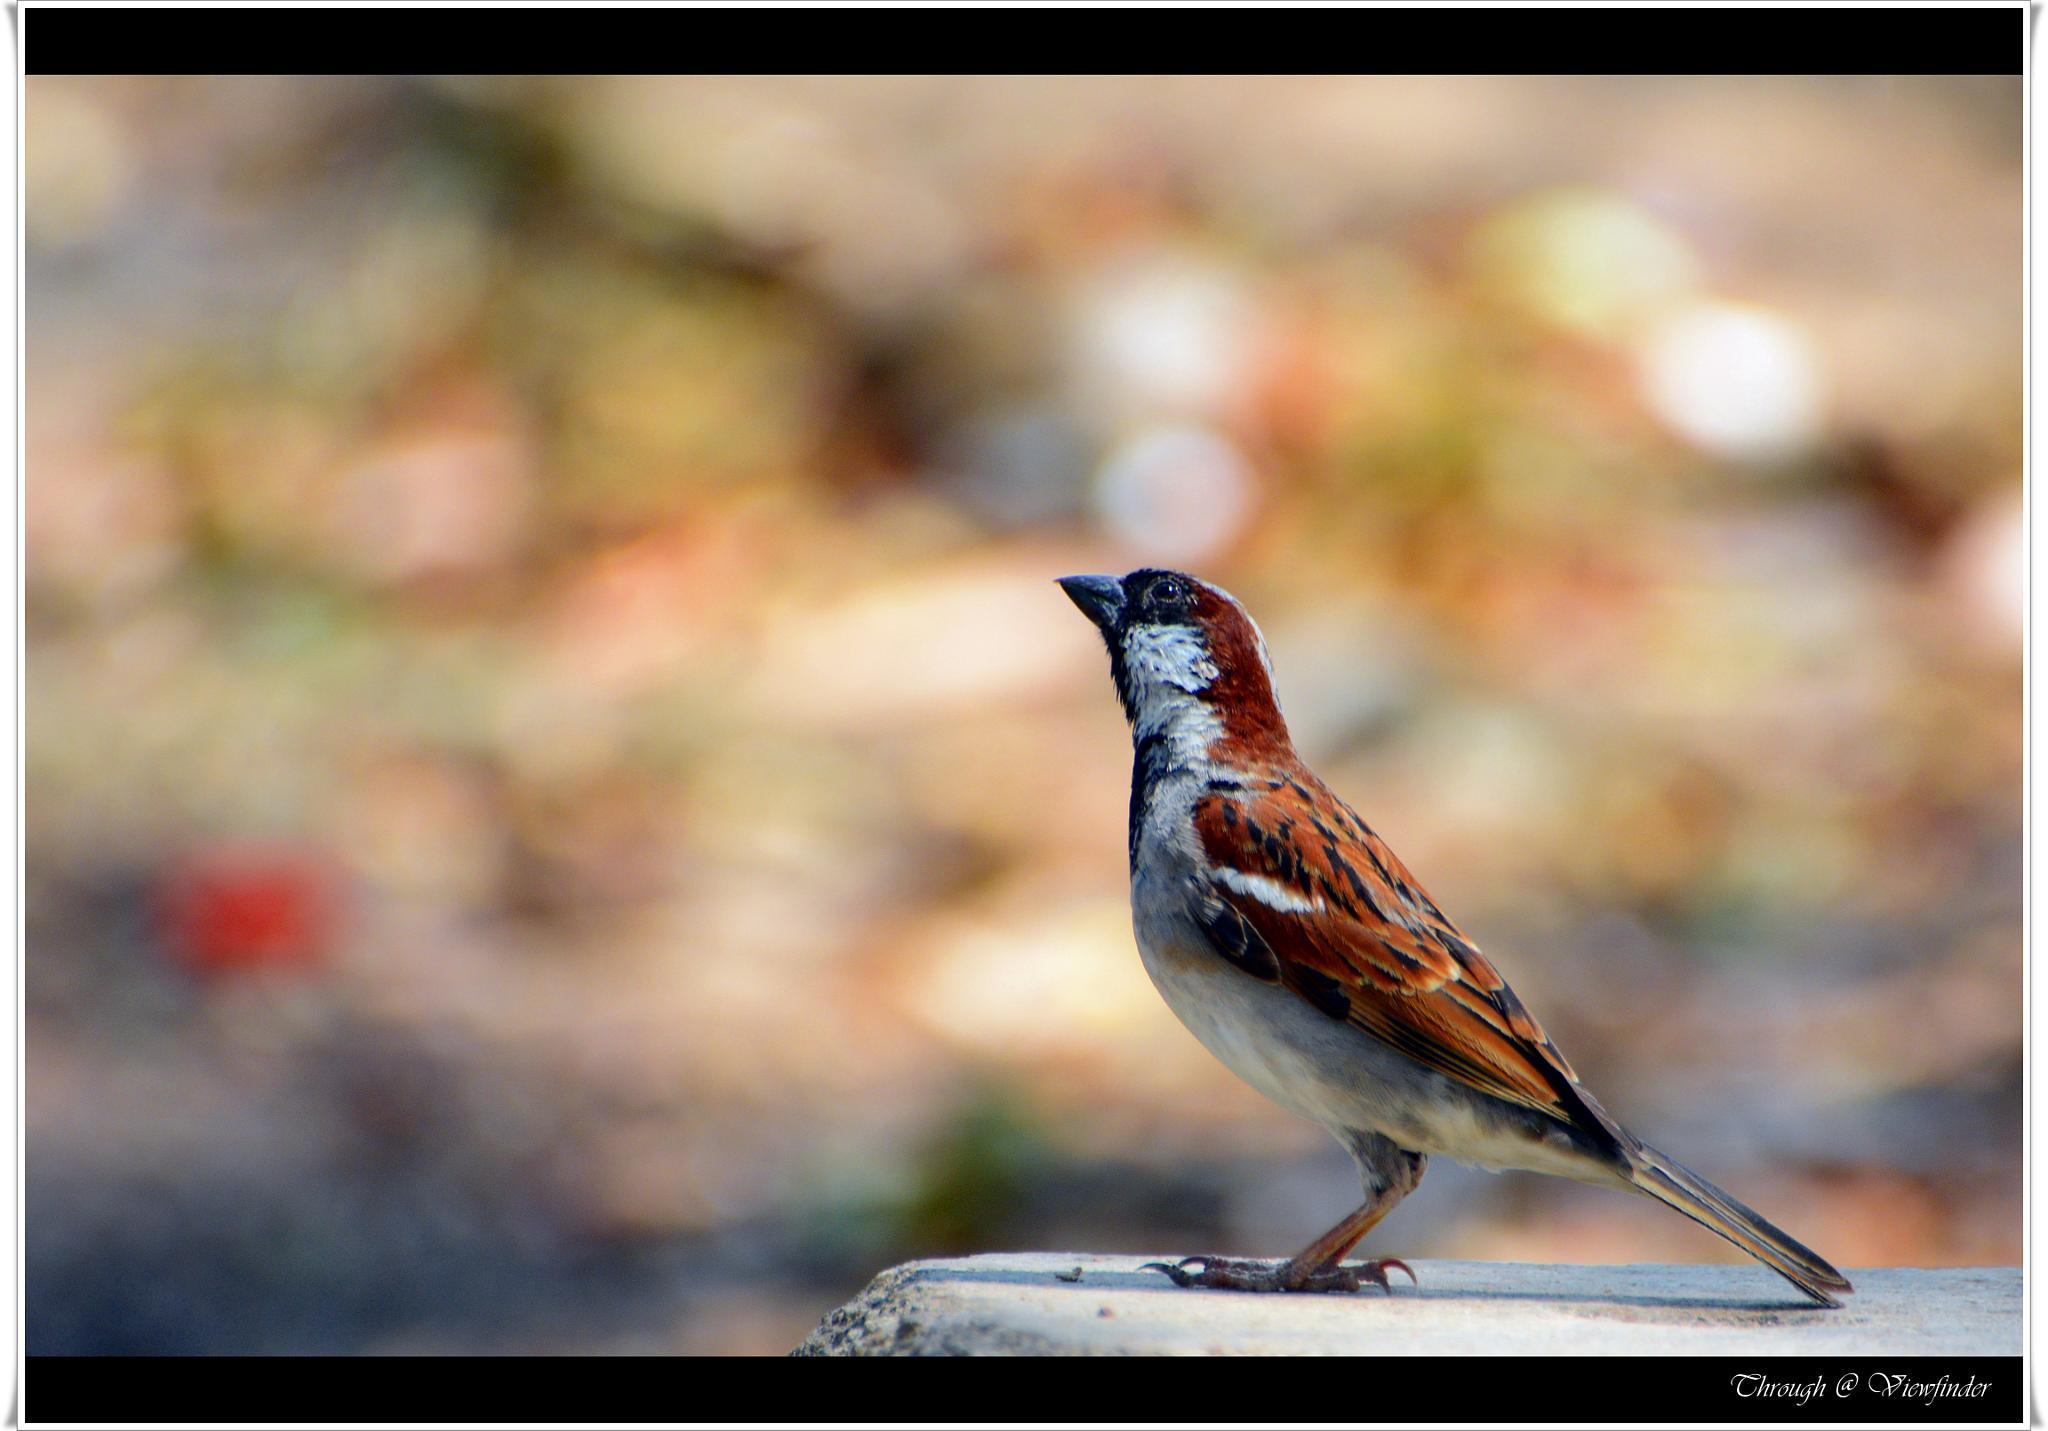 House Sparrow by prashobh.ailyam